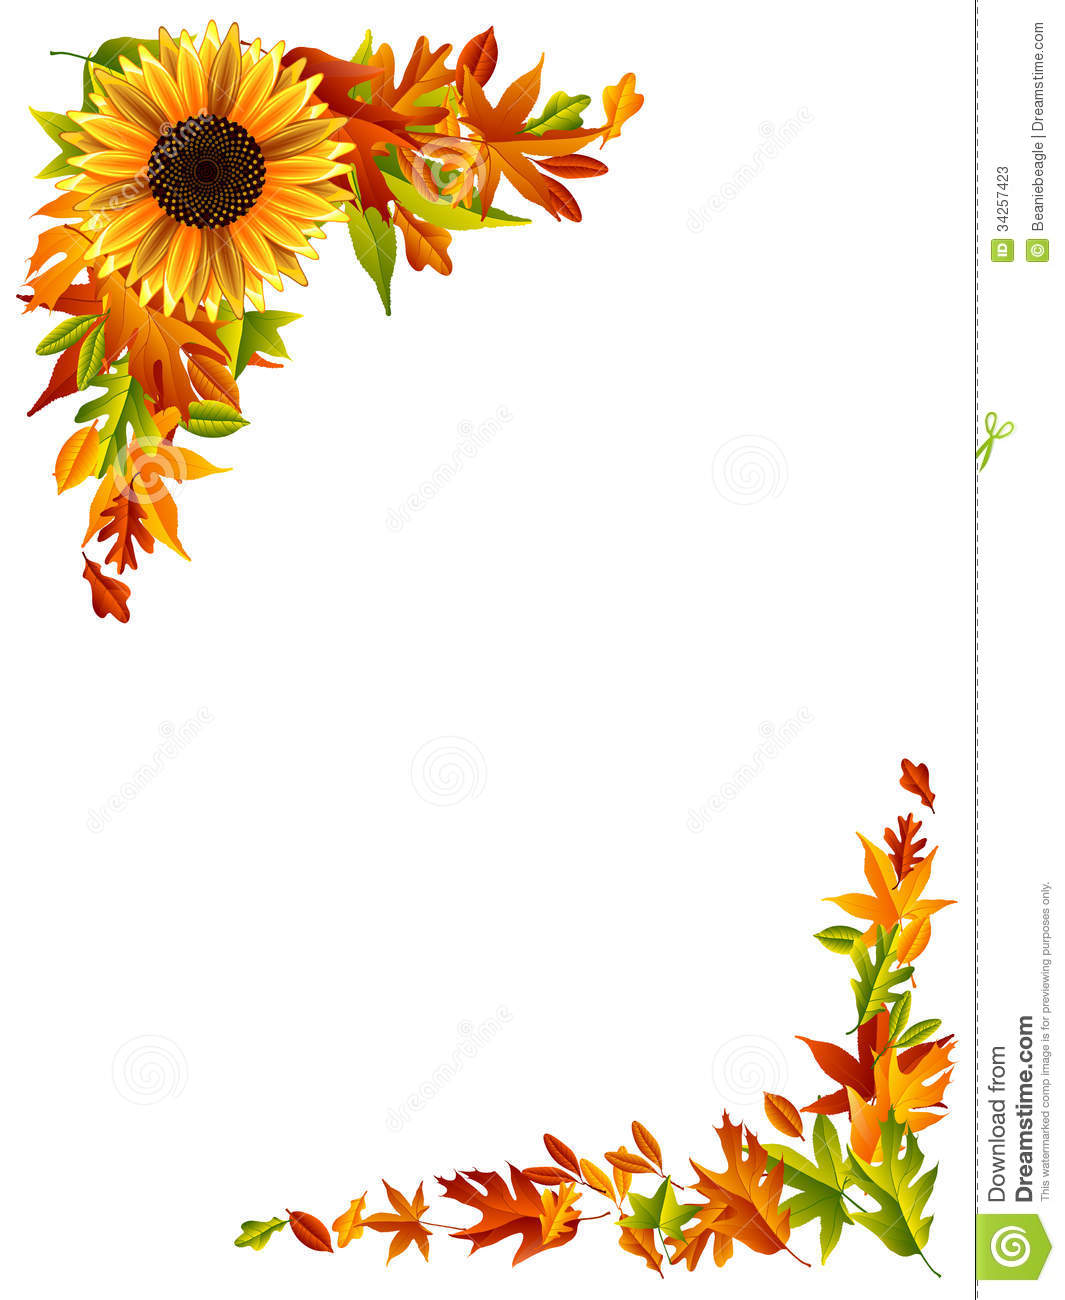 Download Happy Thanksgiving Borders Clip-download happy thanksgiving borders clipart border-2